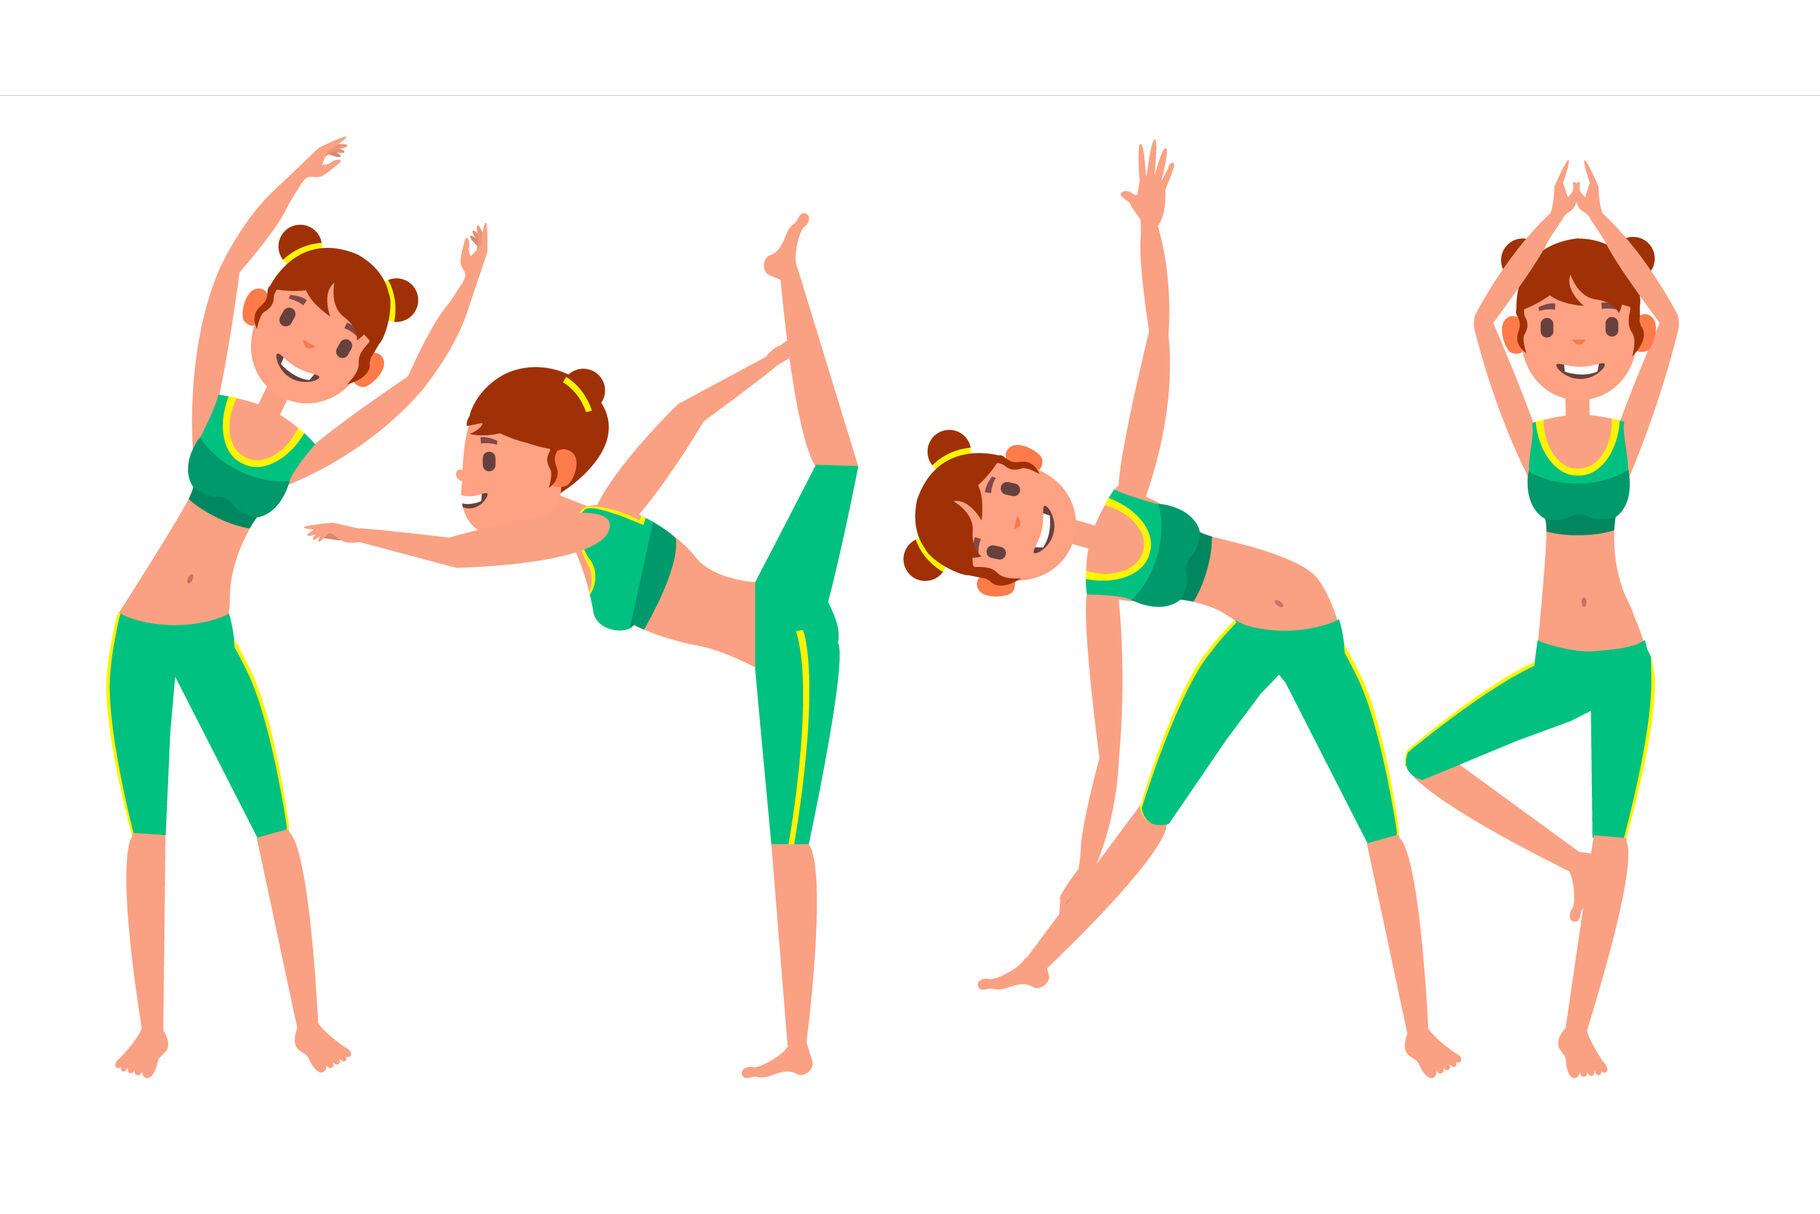 Yoga Woman Poses Set Vector Girl Yoga Poses Doing Yoga Workout Flat Cartoon Illustration By Pikepicture Thehungryjpeg Com